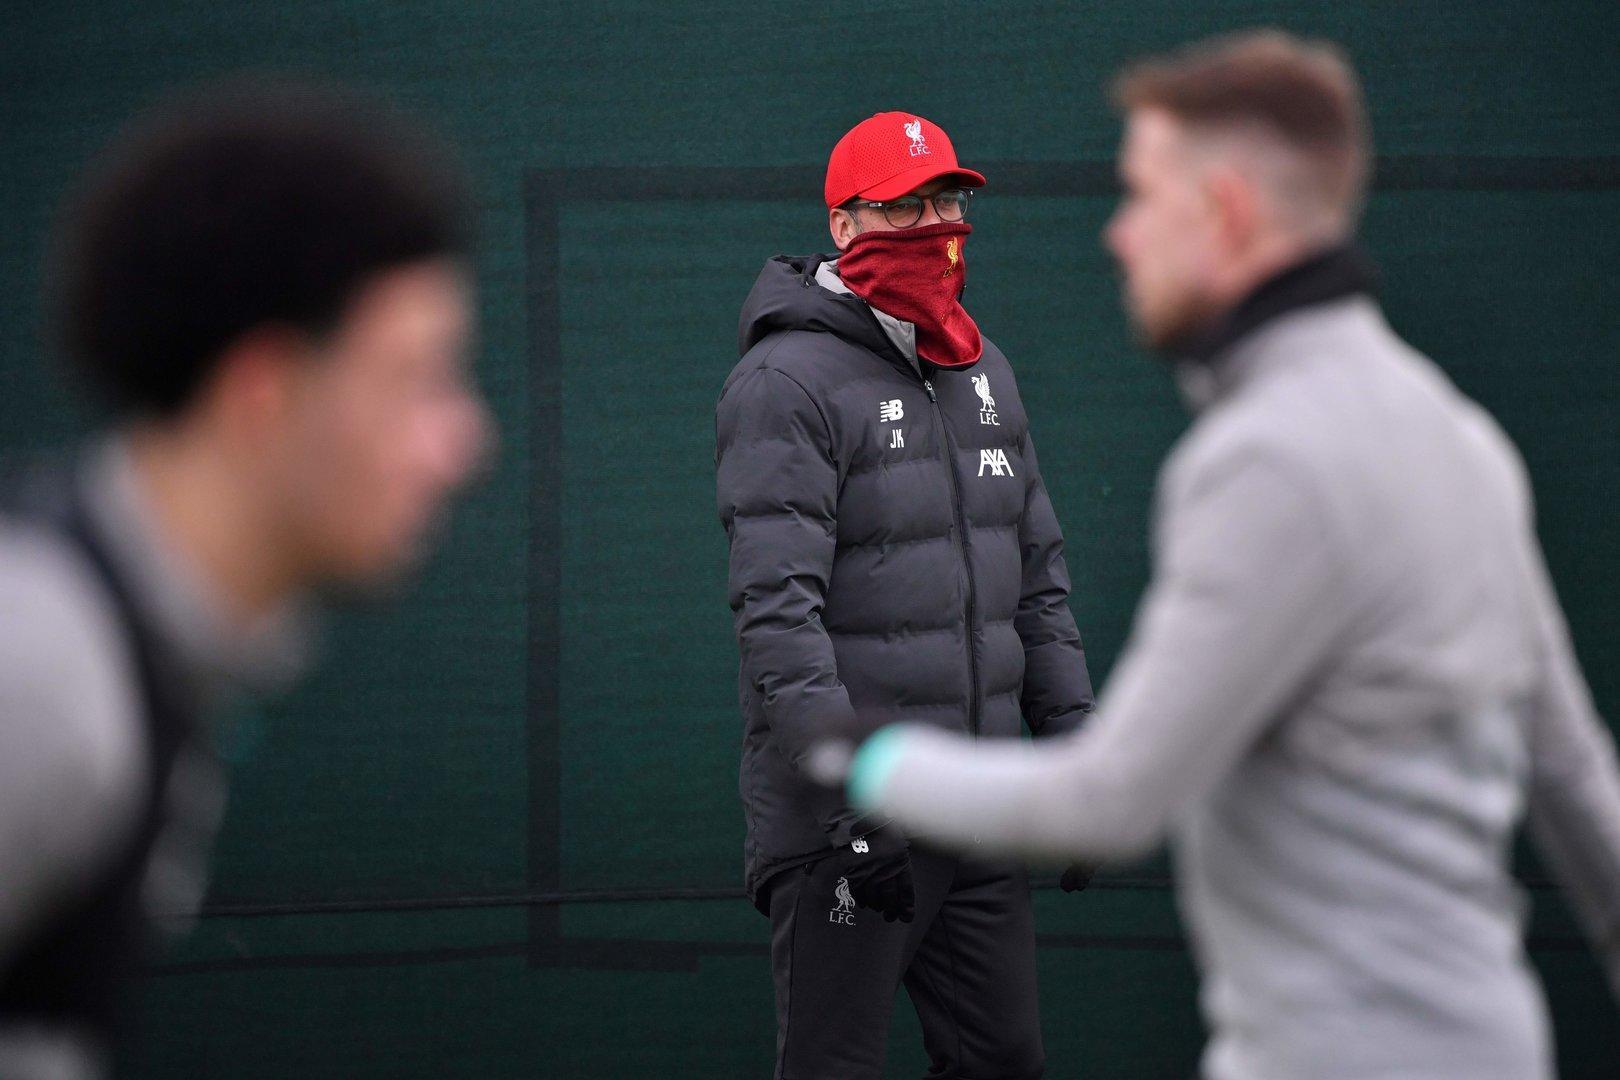 Corona-Krise: Premier League startet, BBC ist live dabei